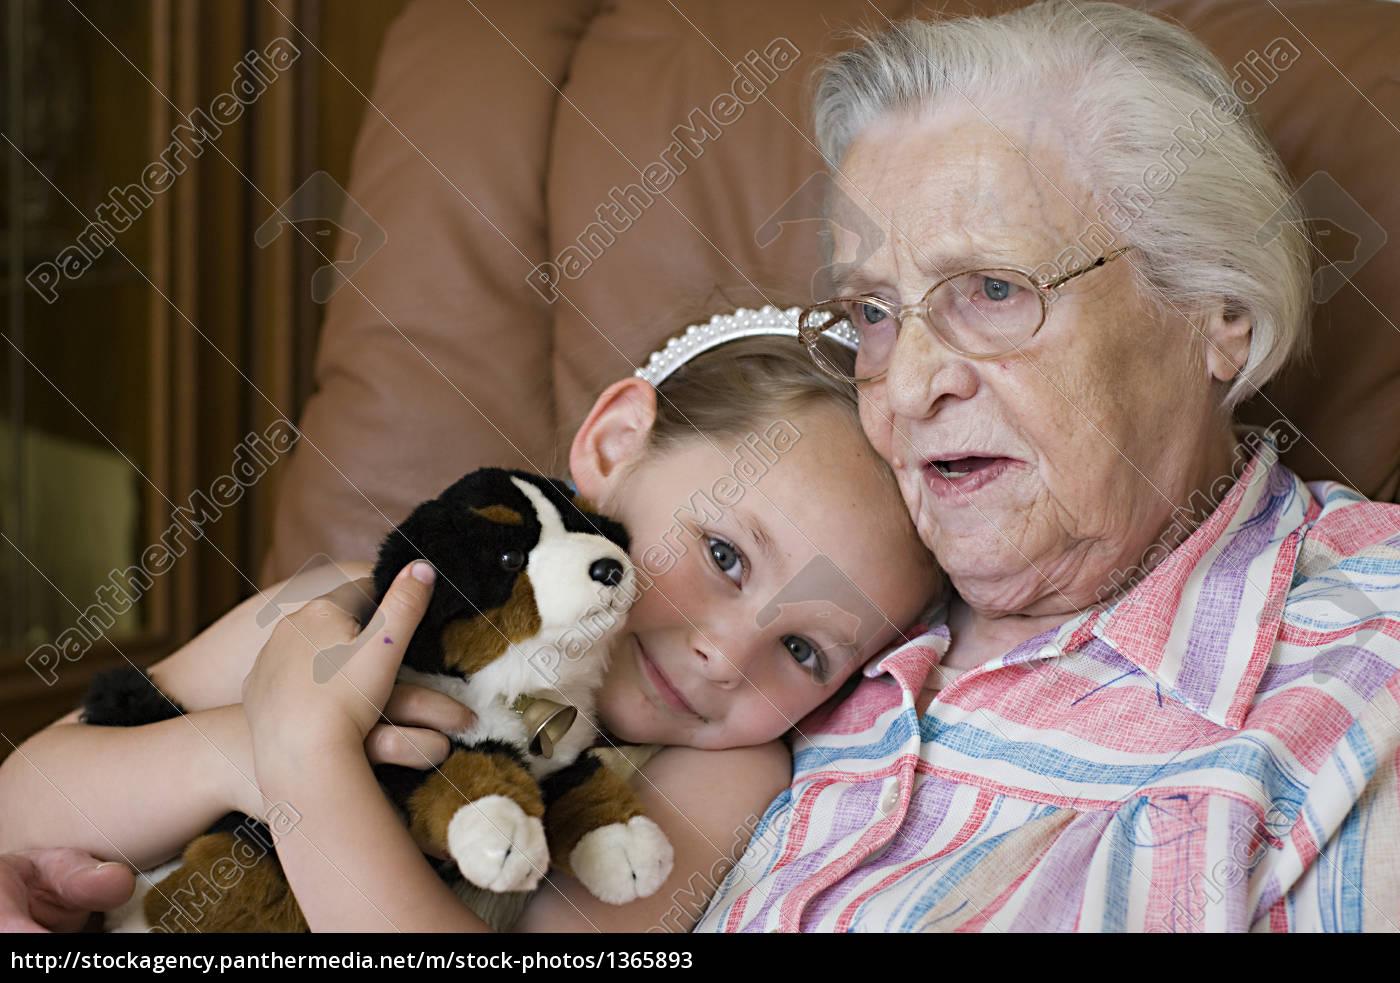 security, at, grandmother - 1365893